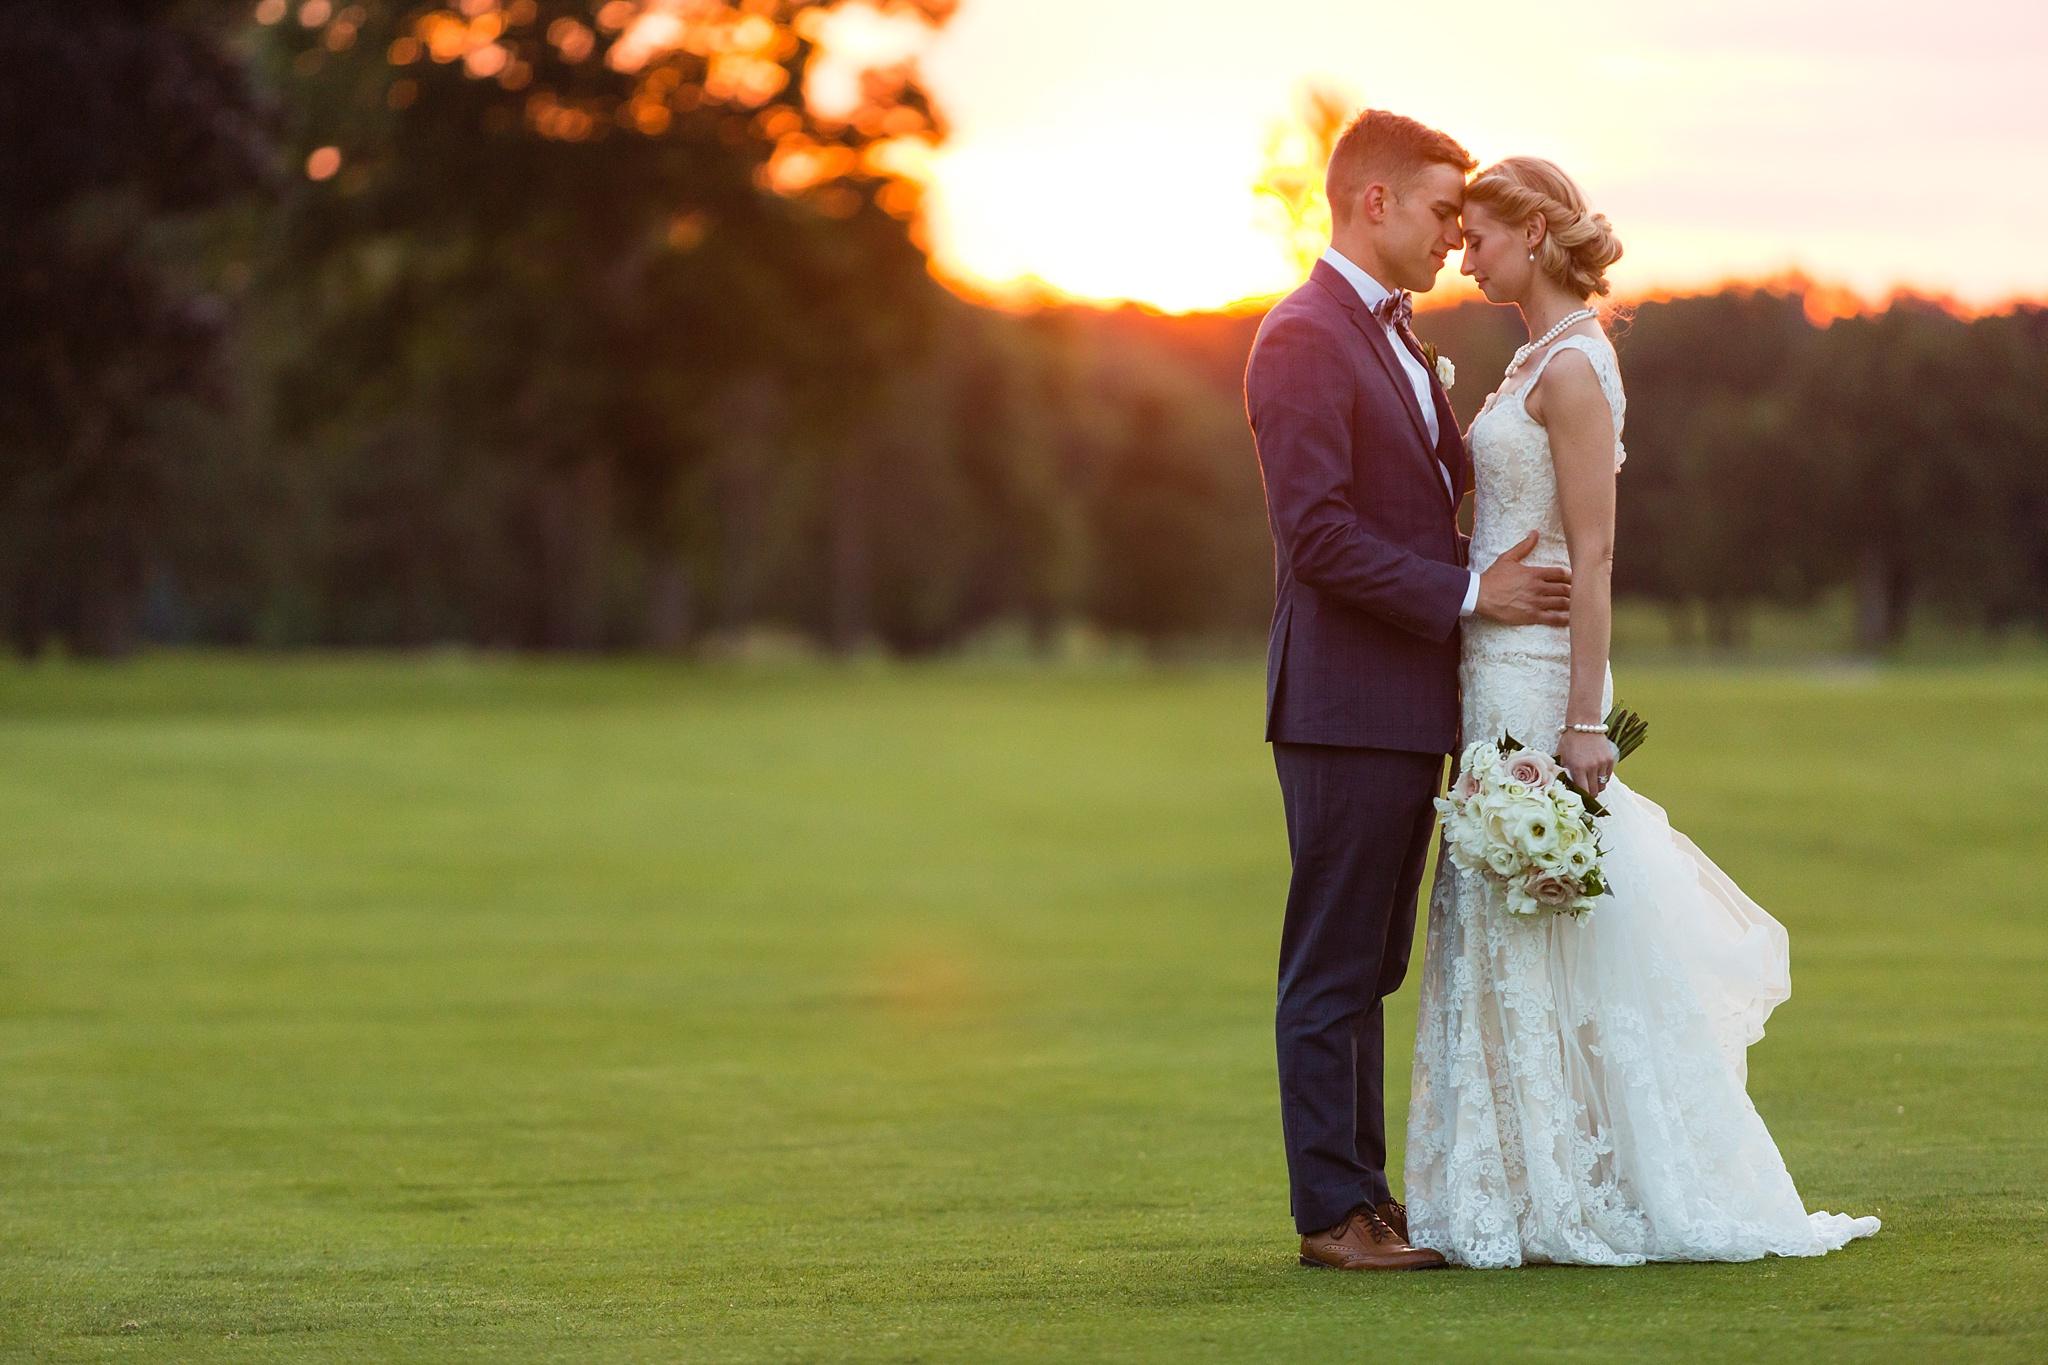 Becky_Cameron_Grand_Rapids_Blythefield Country_Club_Wedding062.JPG